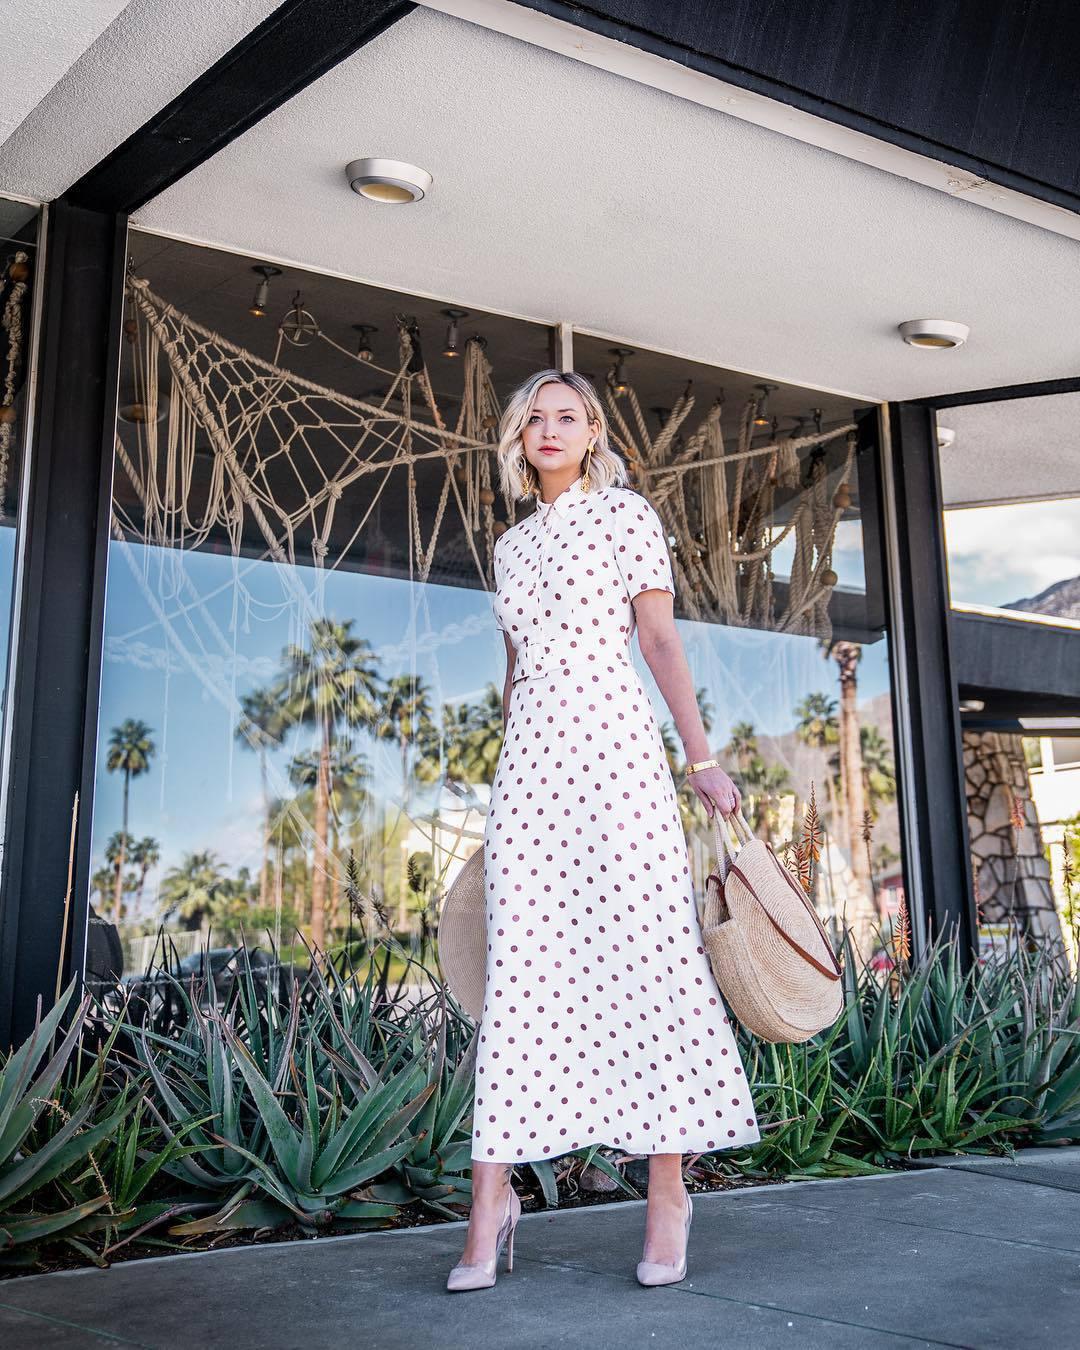 dress maxi dress white dress polka dots pumps shoulder bag hat